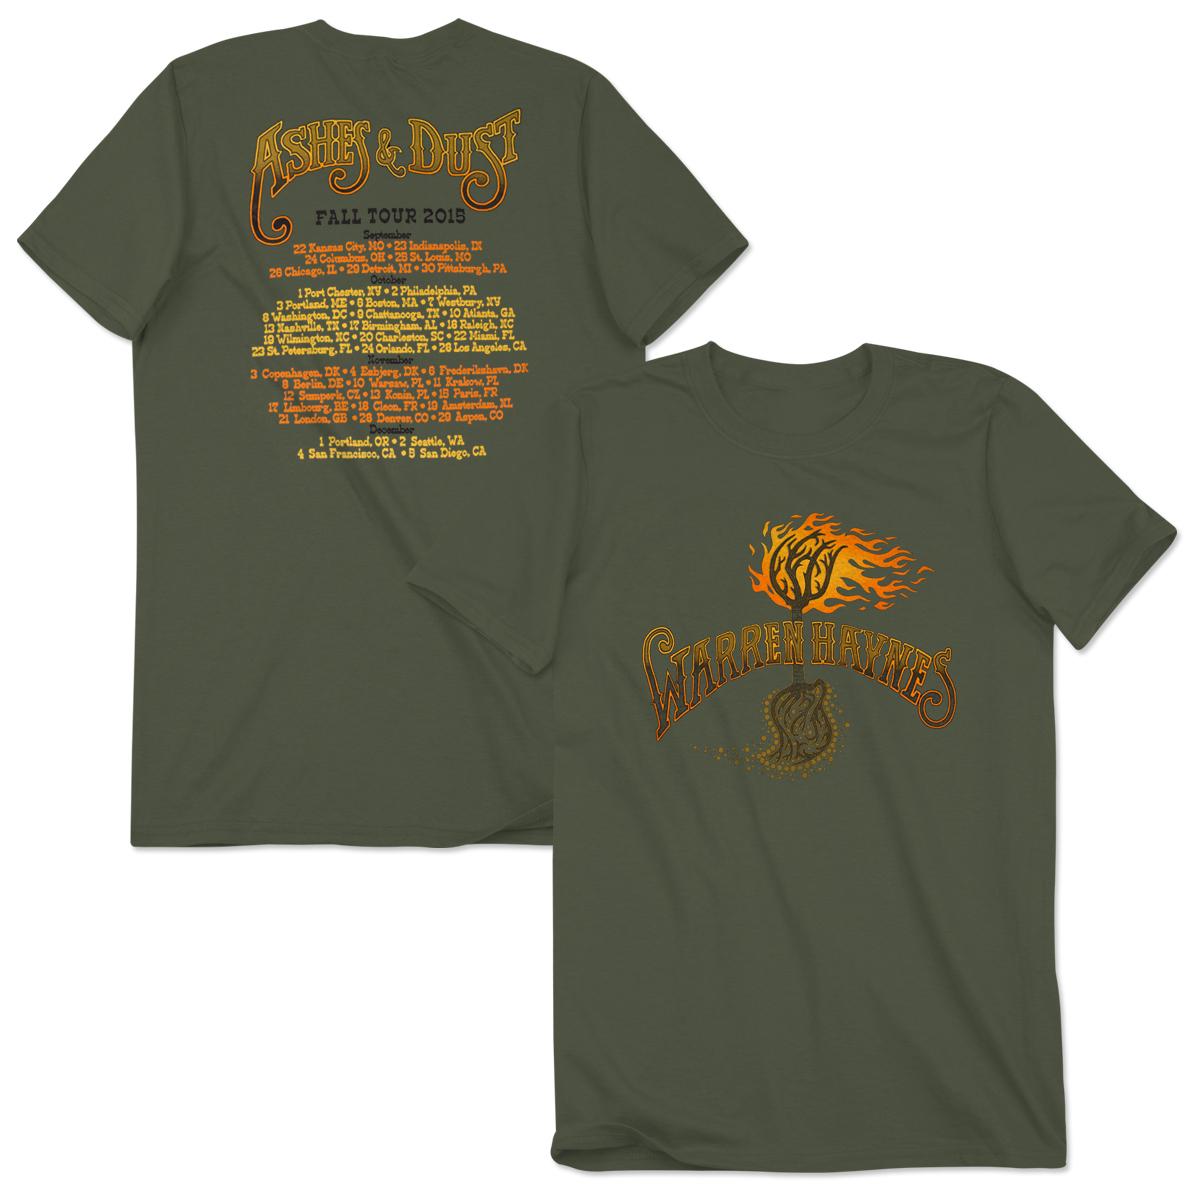 "Warren Haynes ""Ashes & Dust"" 2015 Fall Tour Shirt"